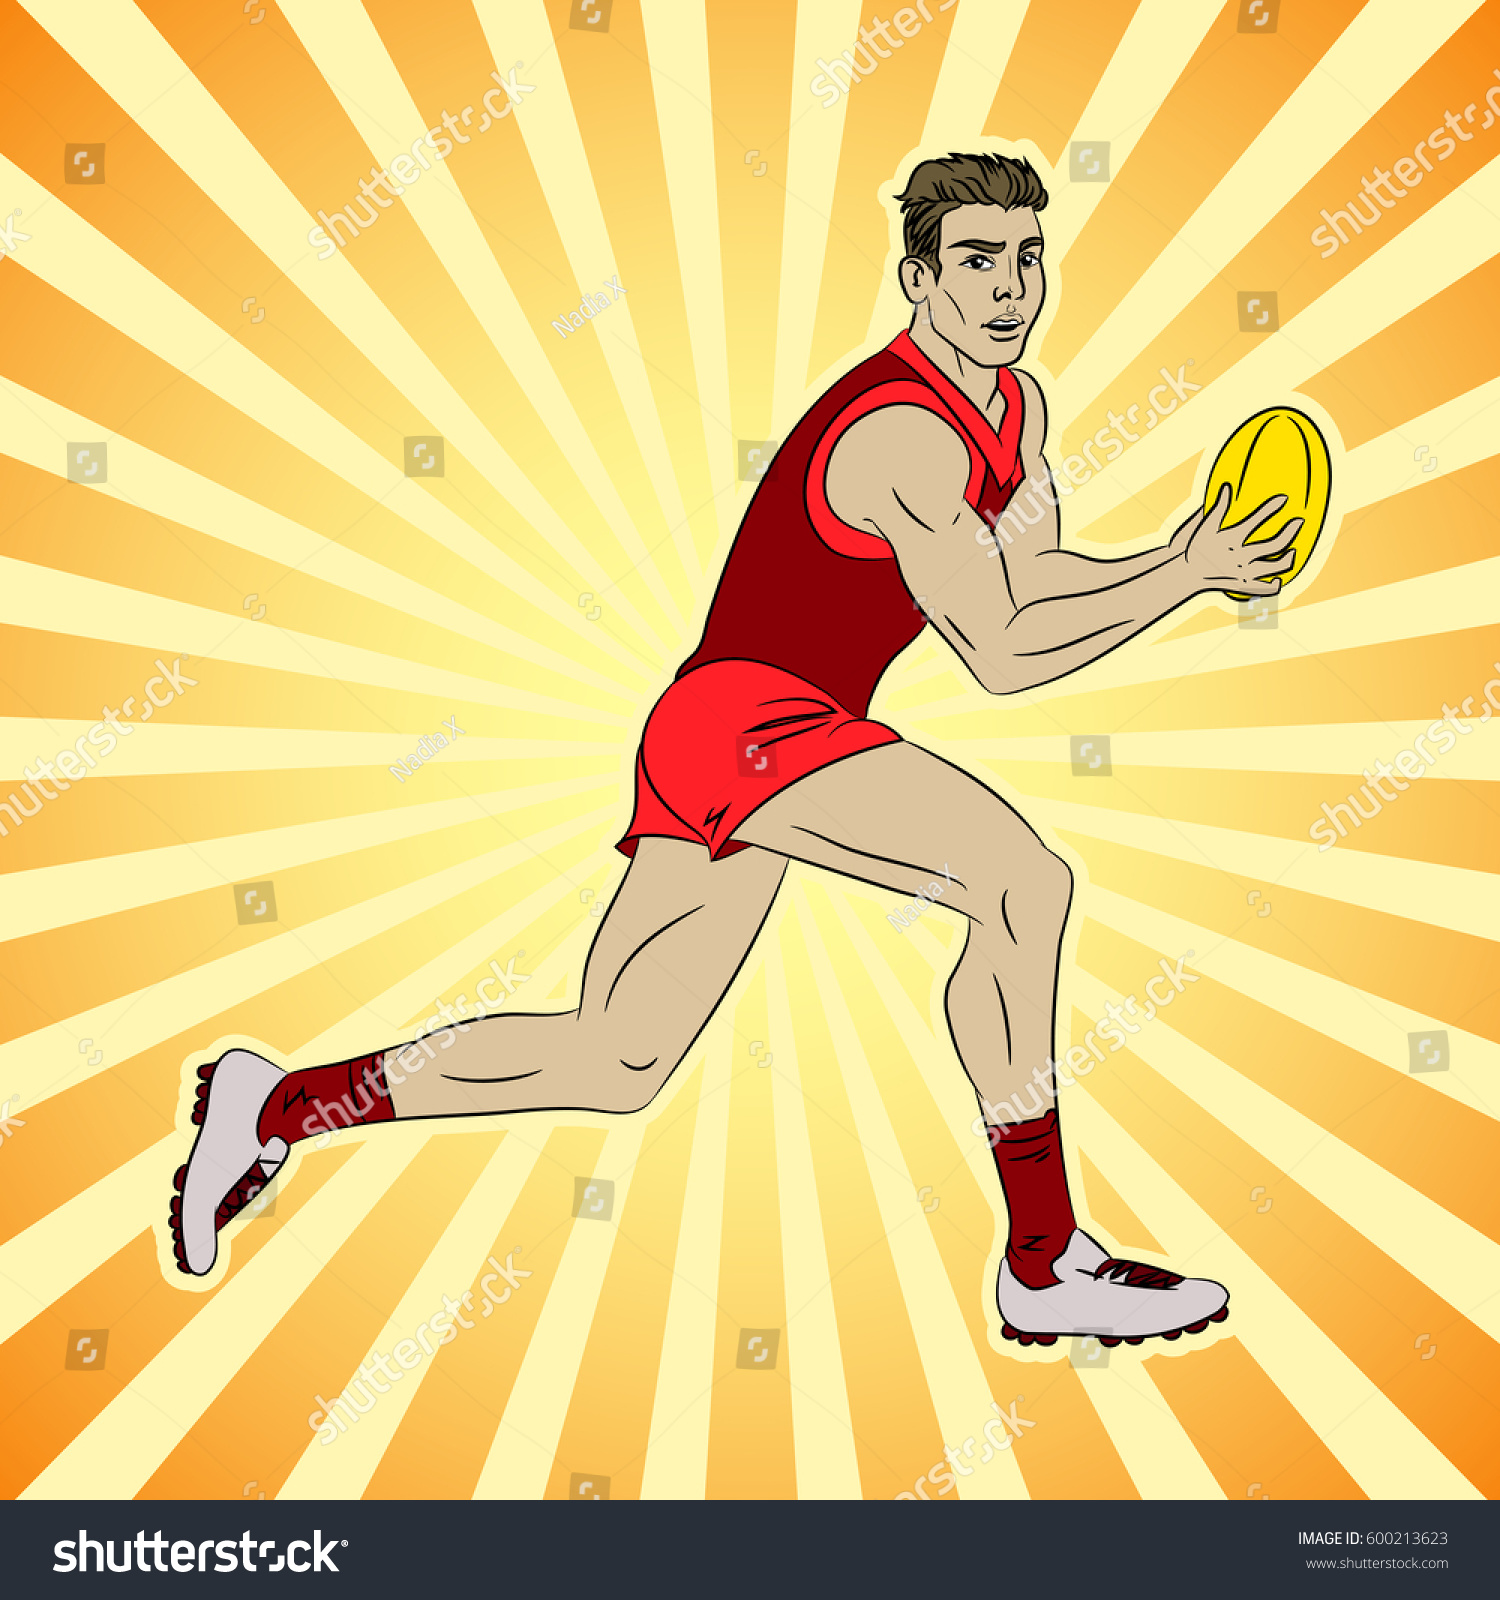 American football cartoon images